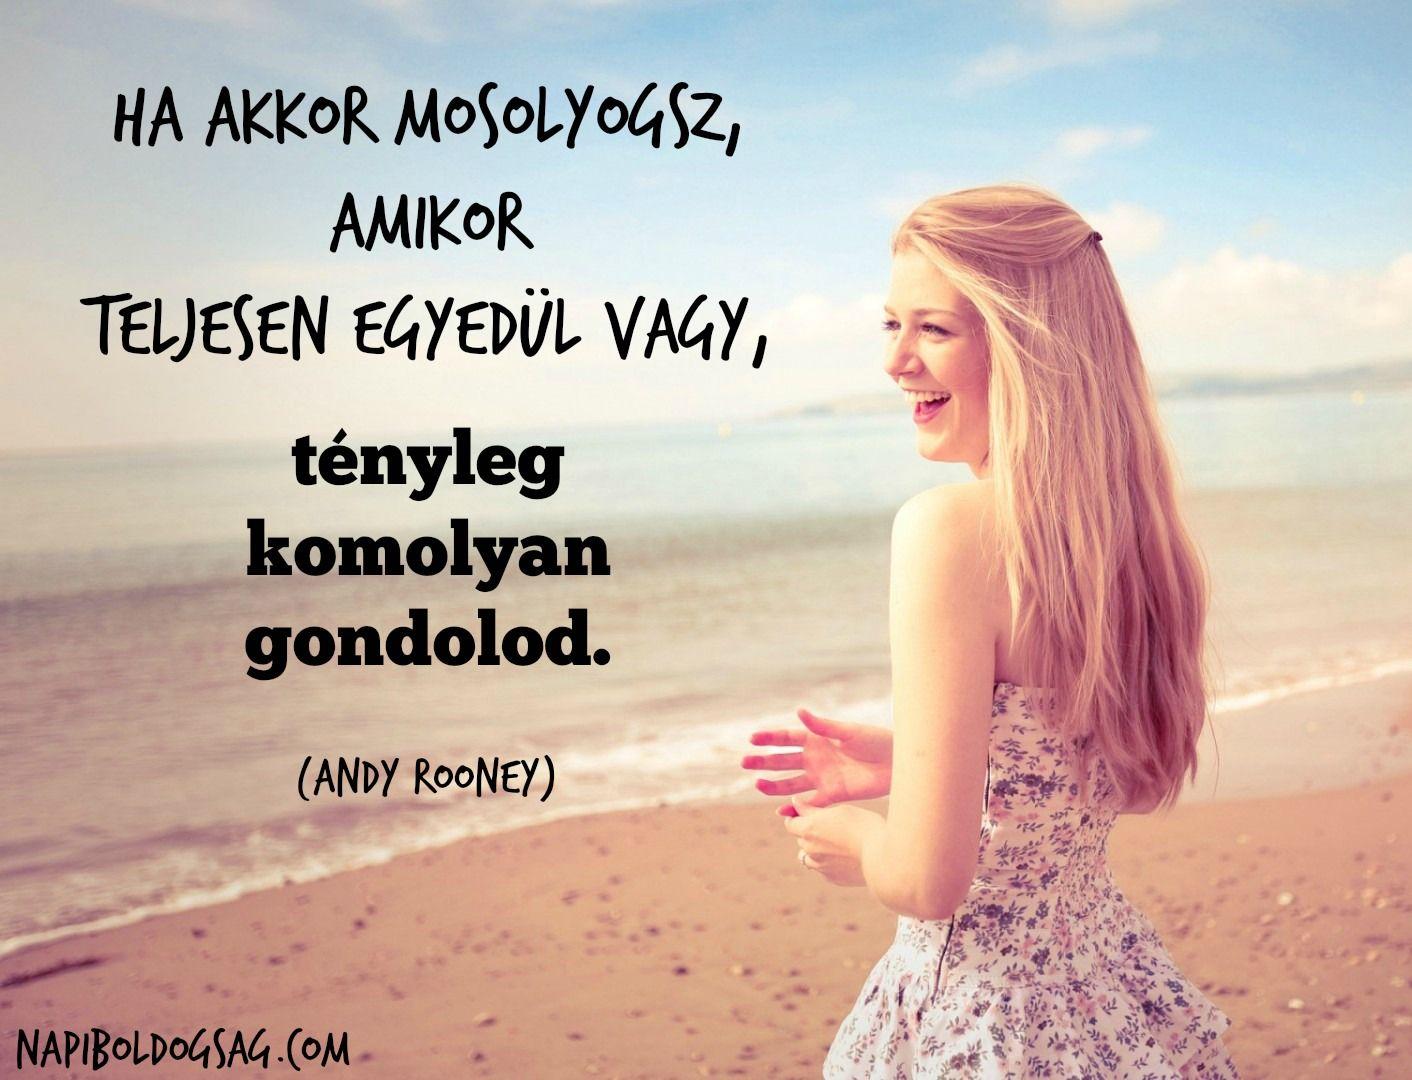 mosoly idézetek képekkel Őszinte mosoly… | Positive quotes, Life quotes, Inspirational quotes